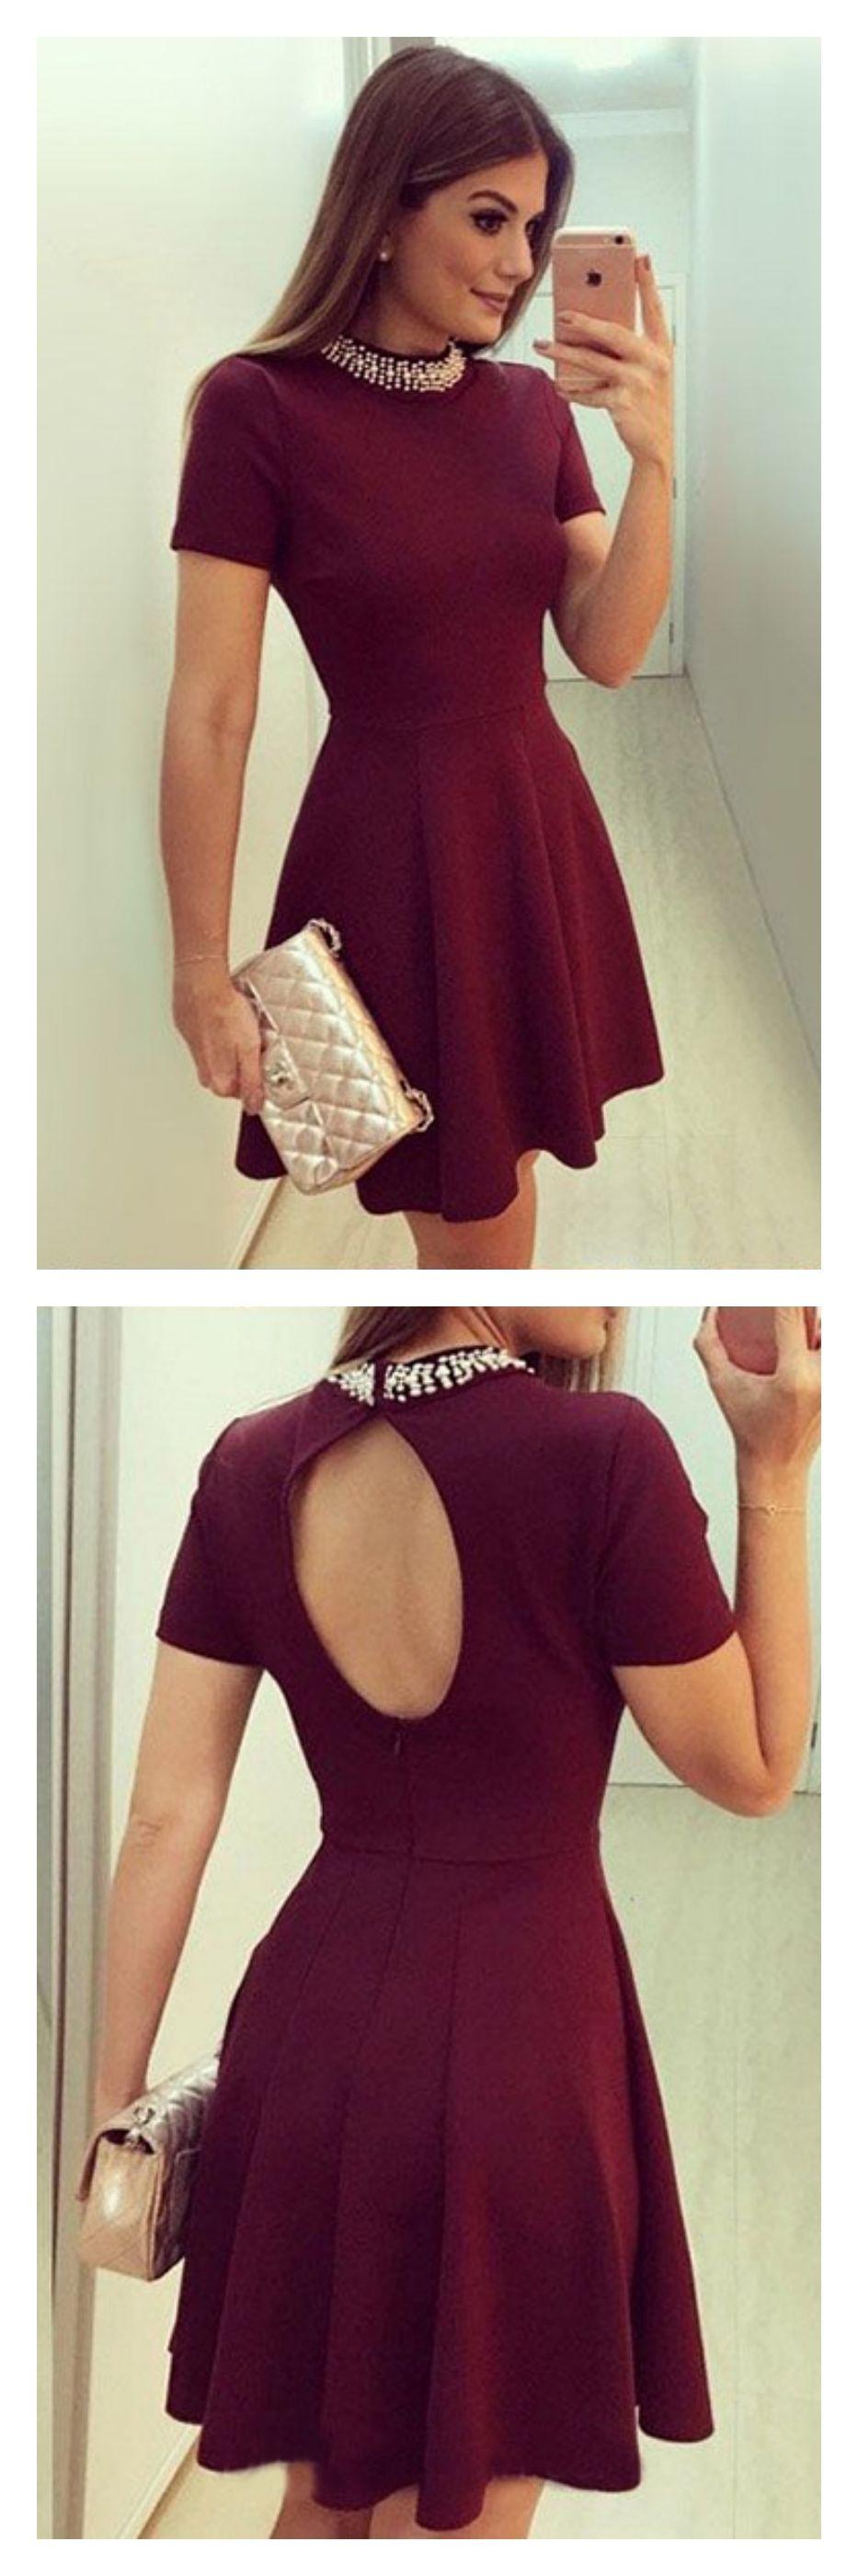 Burgundy high neck short sleeves homecoming dresses ed